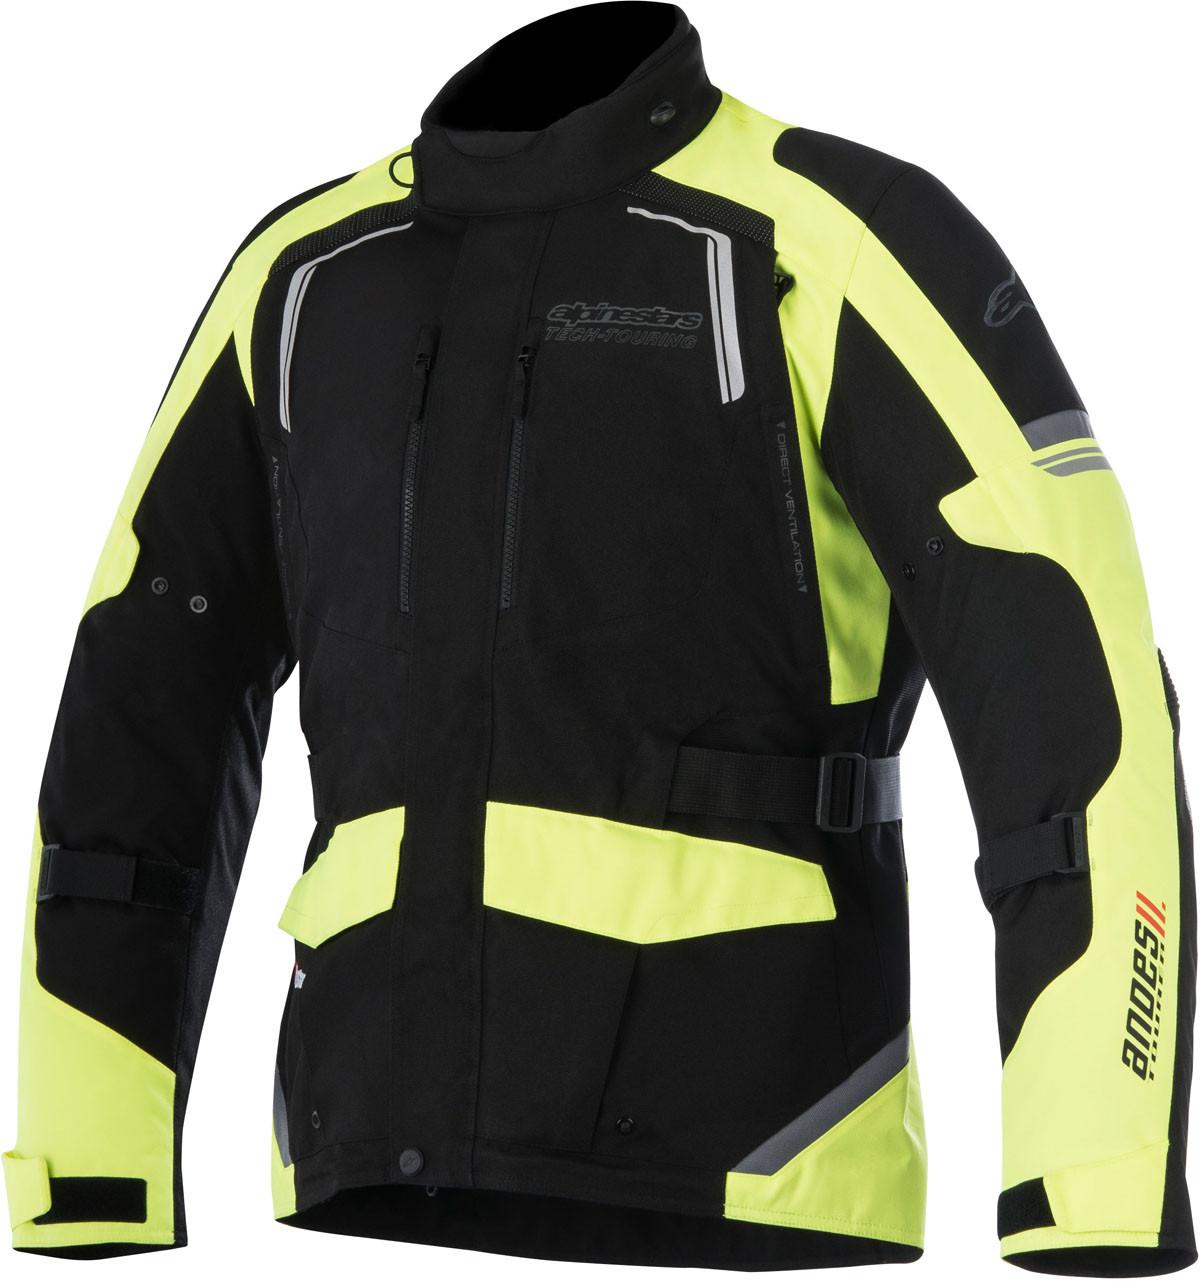 Giacca moto Alpinestars ANDES V2 DRYSTAR nero giallo fluo